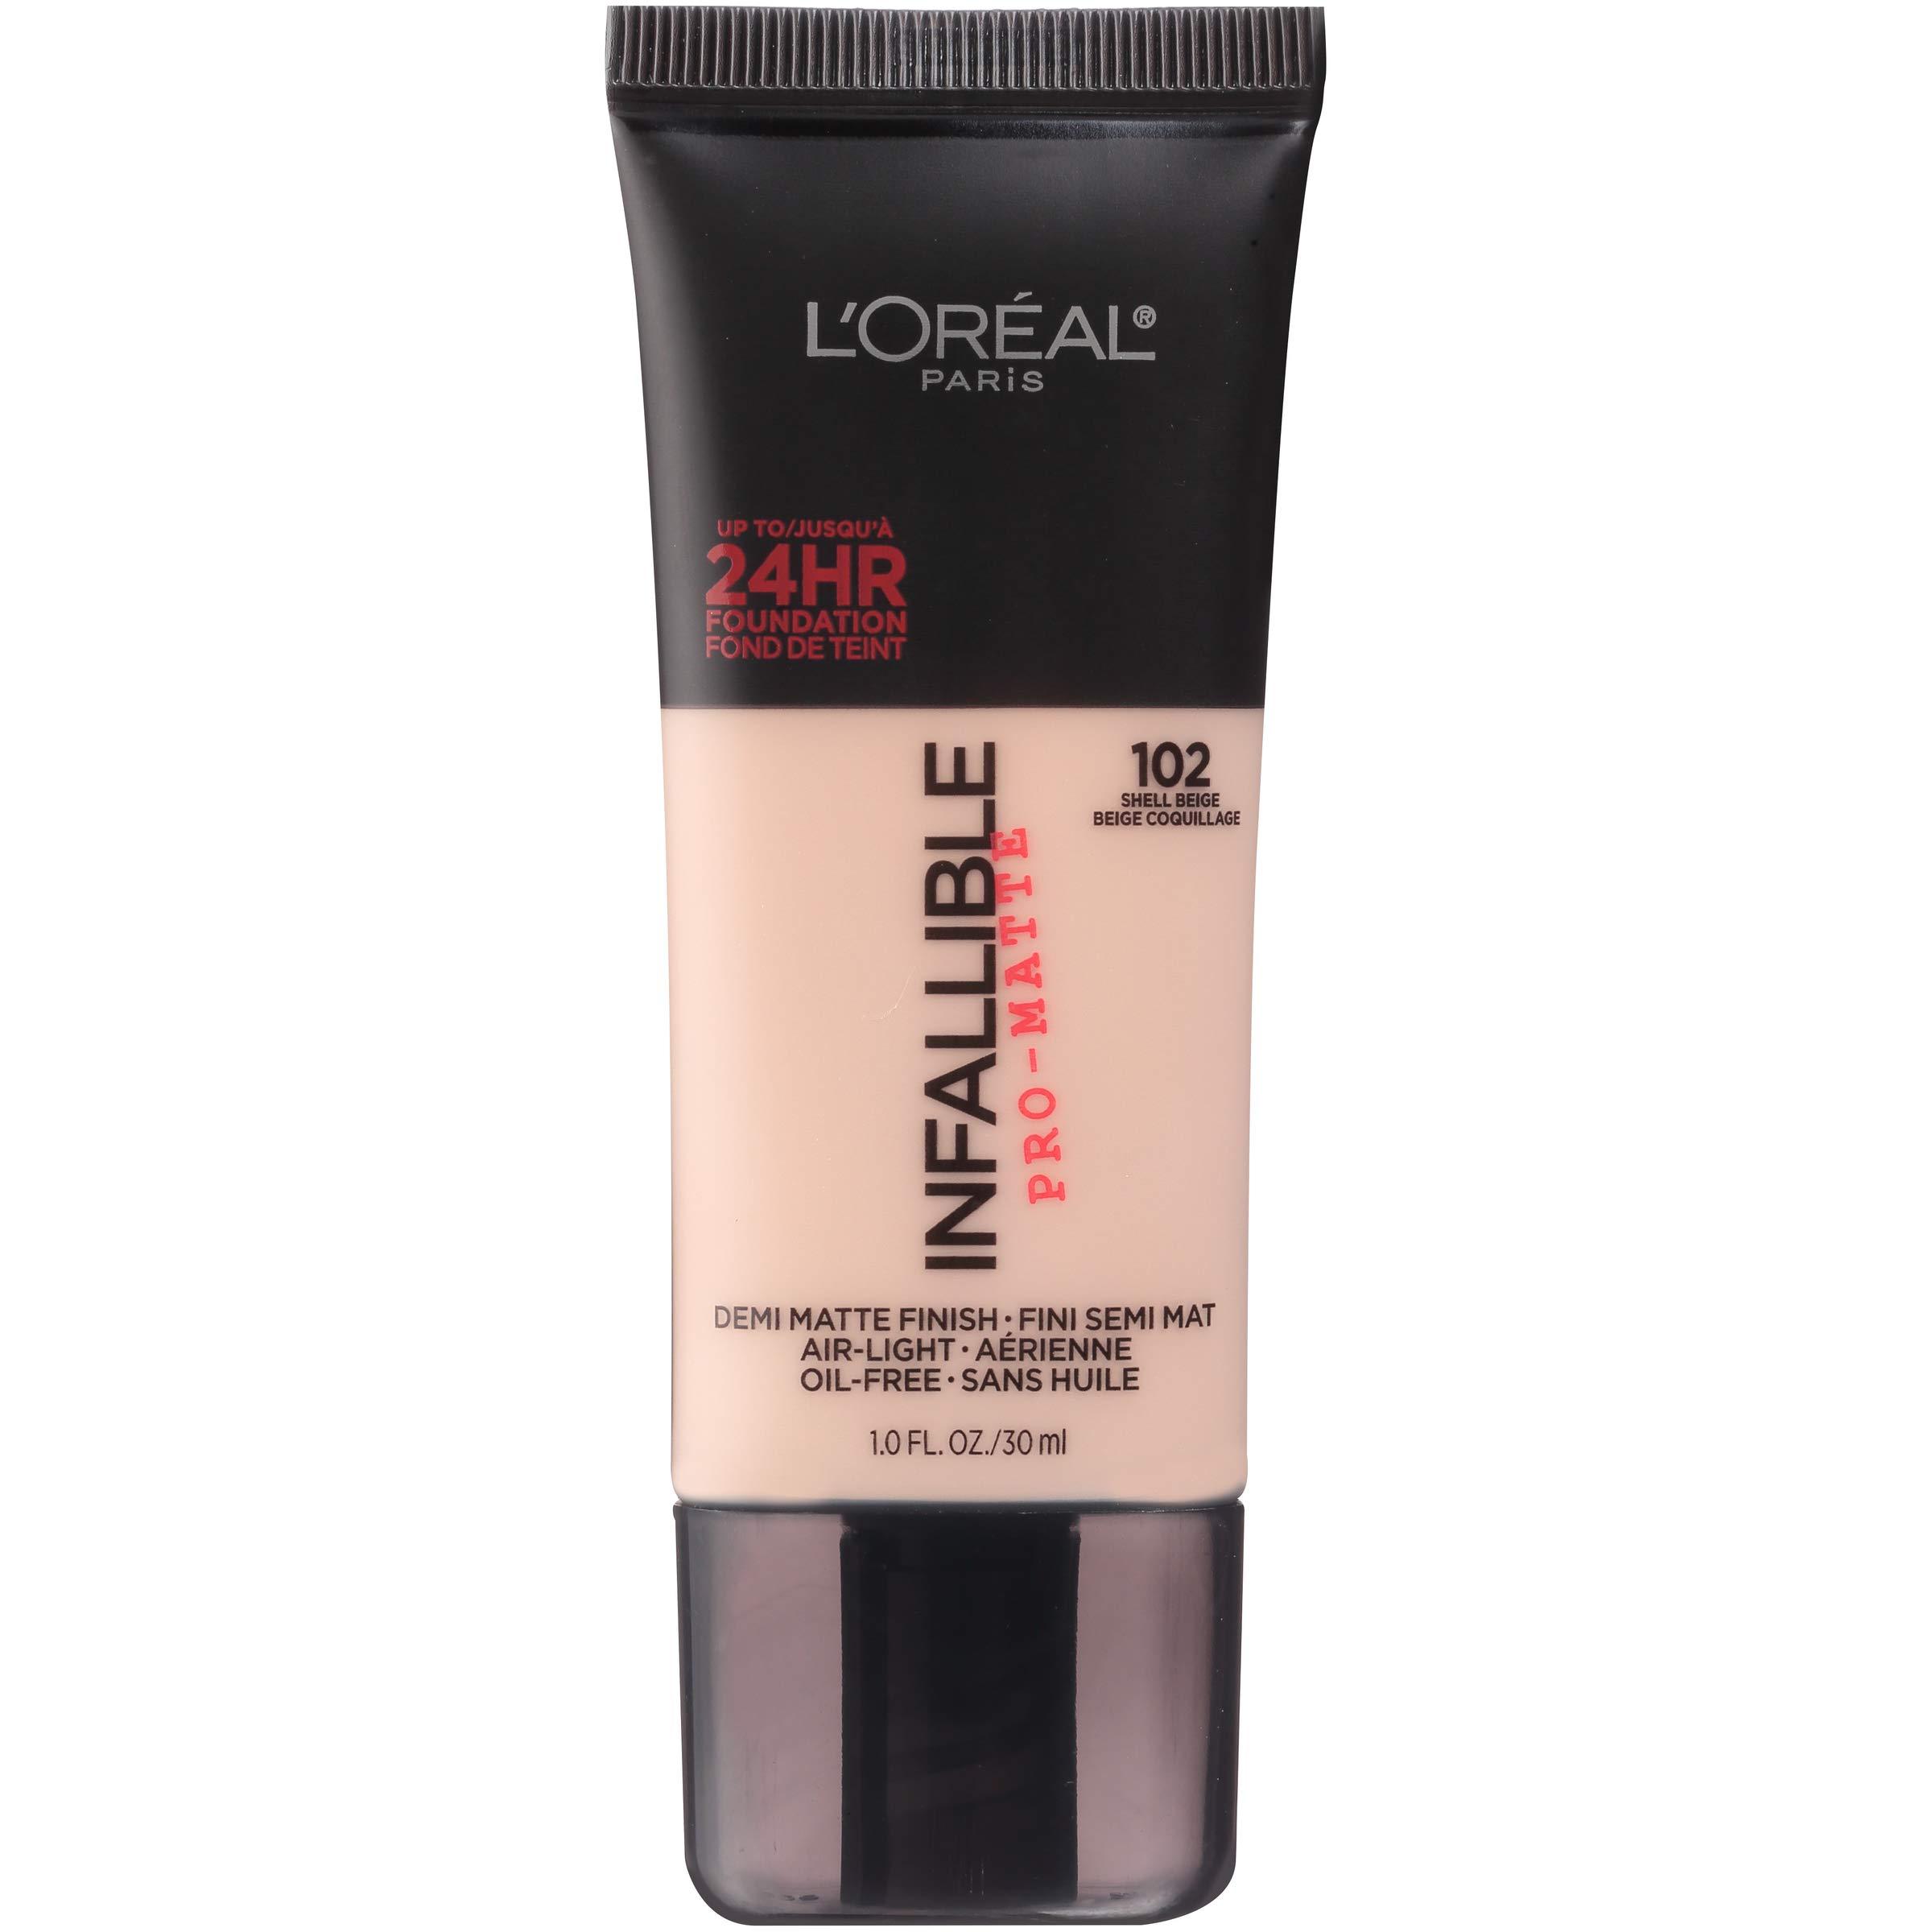 Loral Paris Makeup Brow Stylist Shape Fill Lt Pro High Definition Perfect Foundation 30 Ml Infallible Matte 102 Shell Beige 1